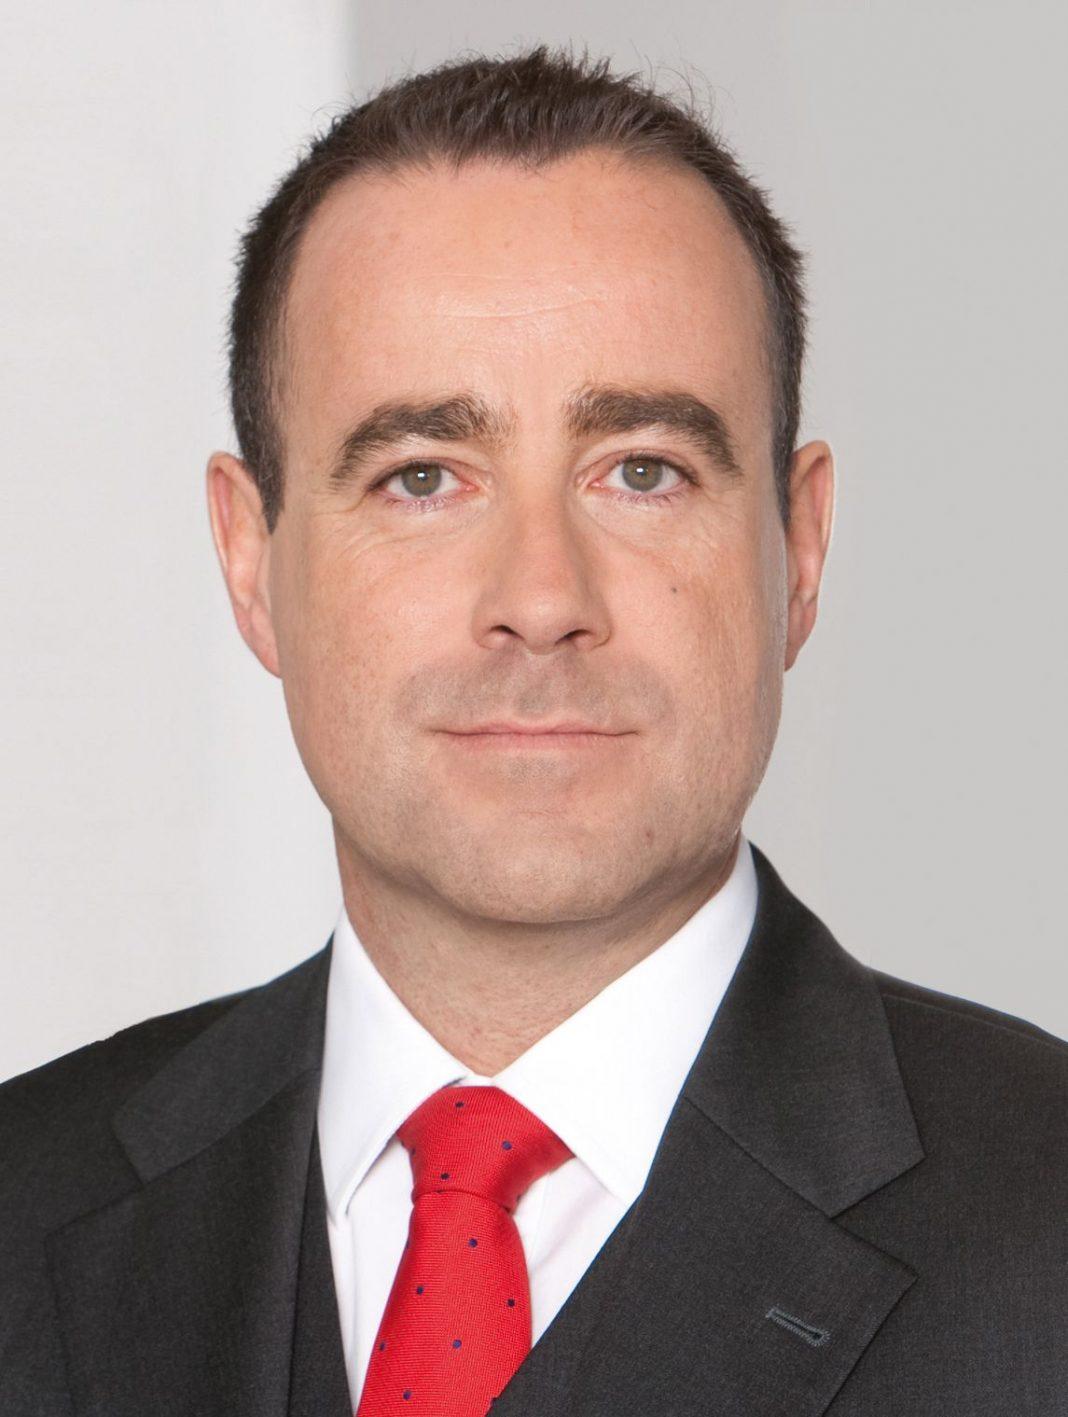 Andreas Helber, BayWa AG